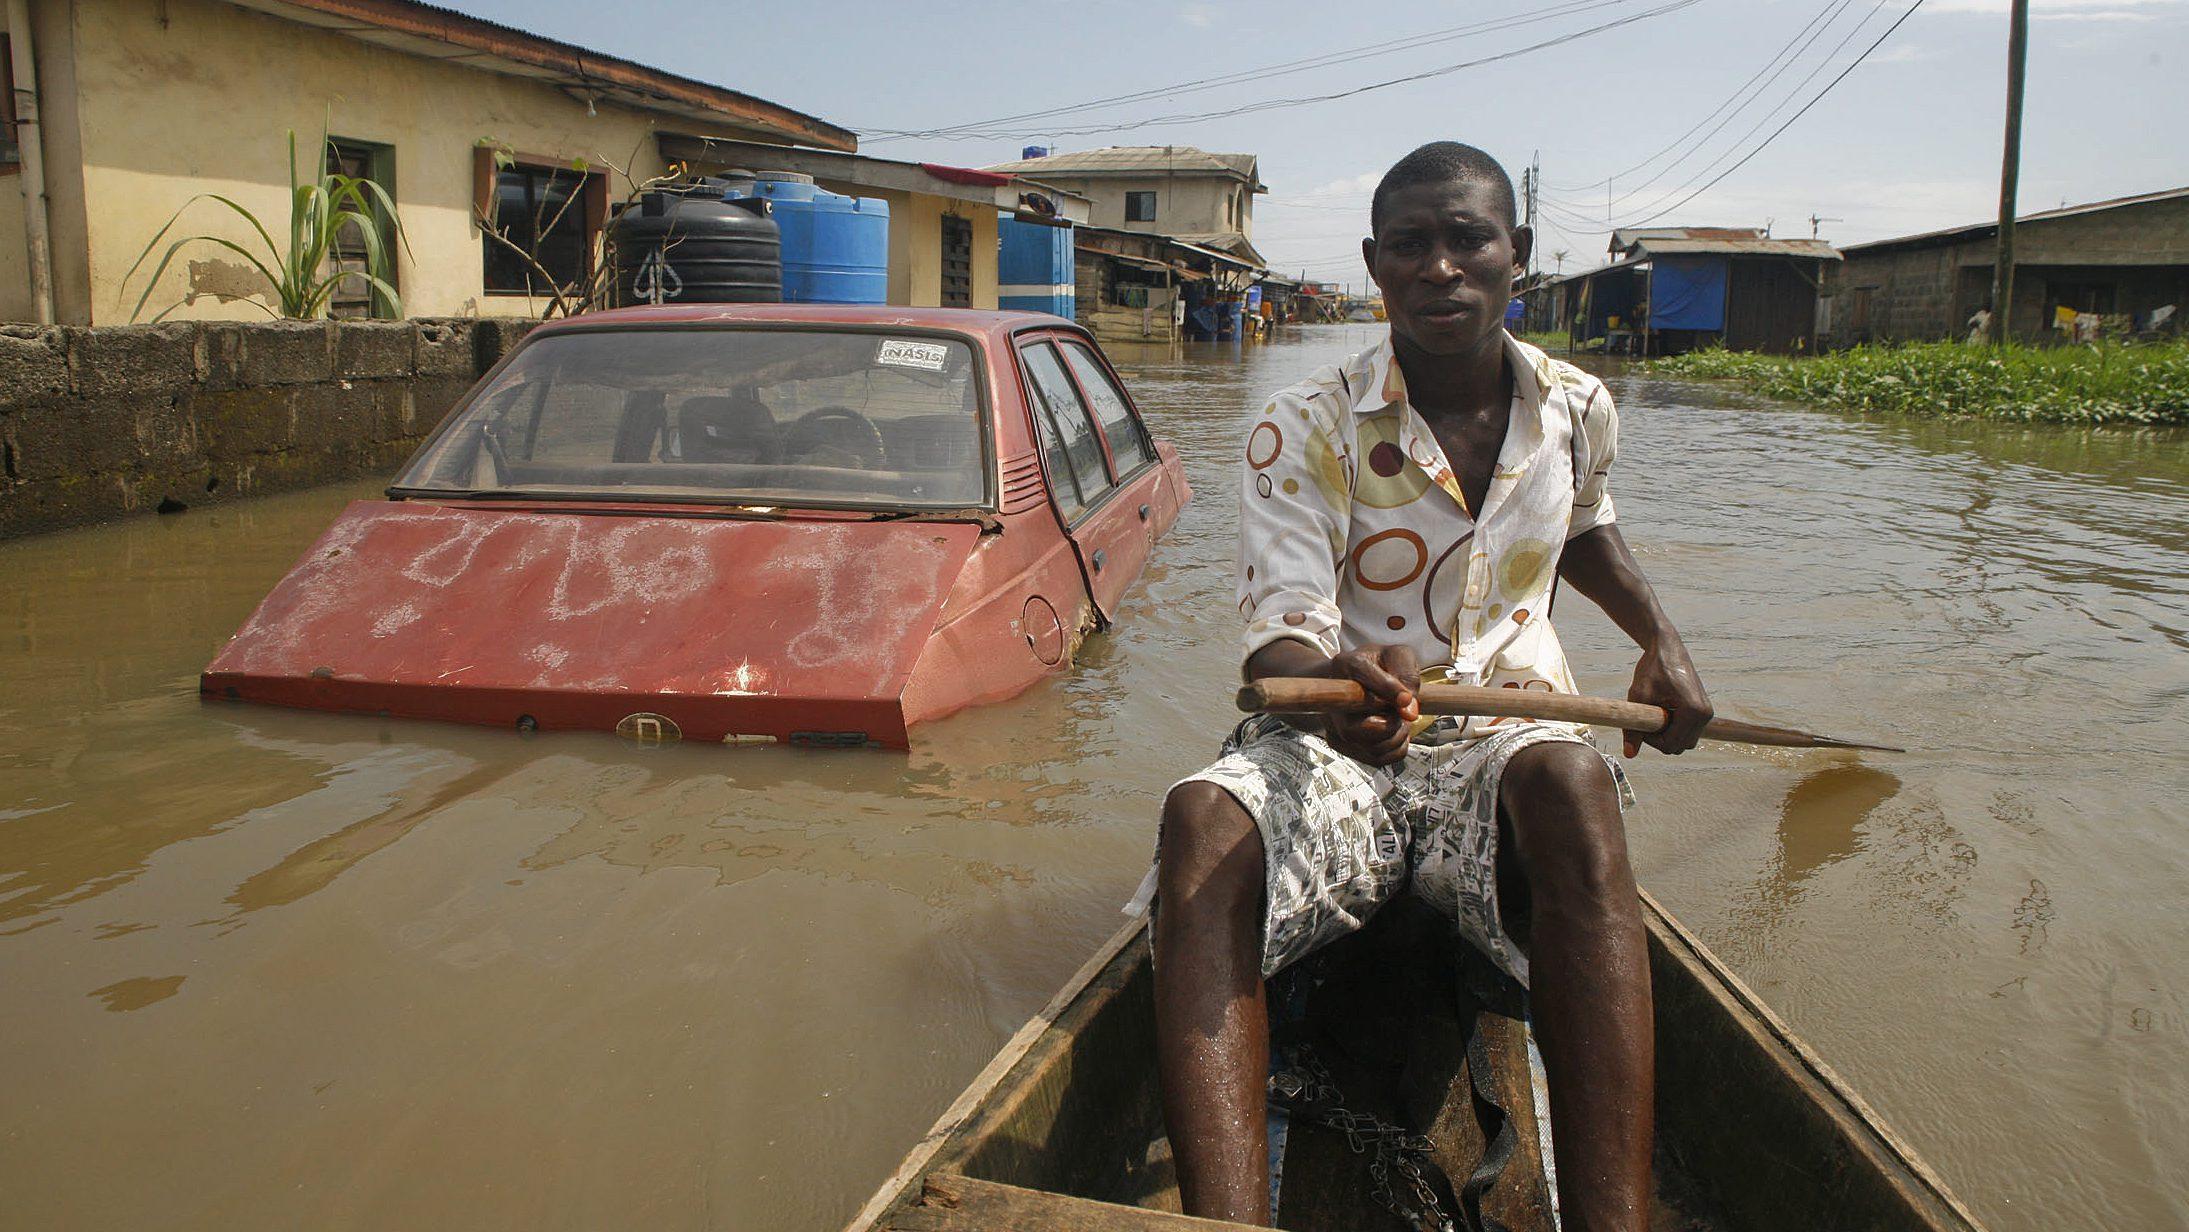 Floods displace 200 in Ajegunle, Nigeria